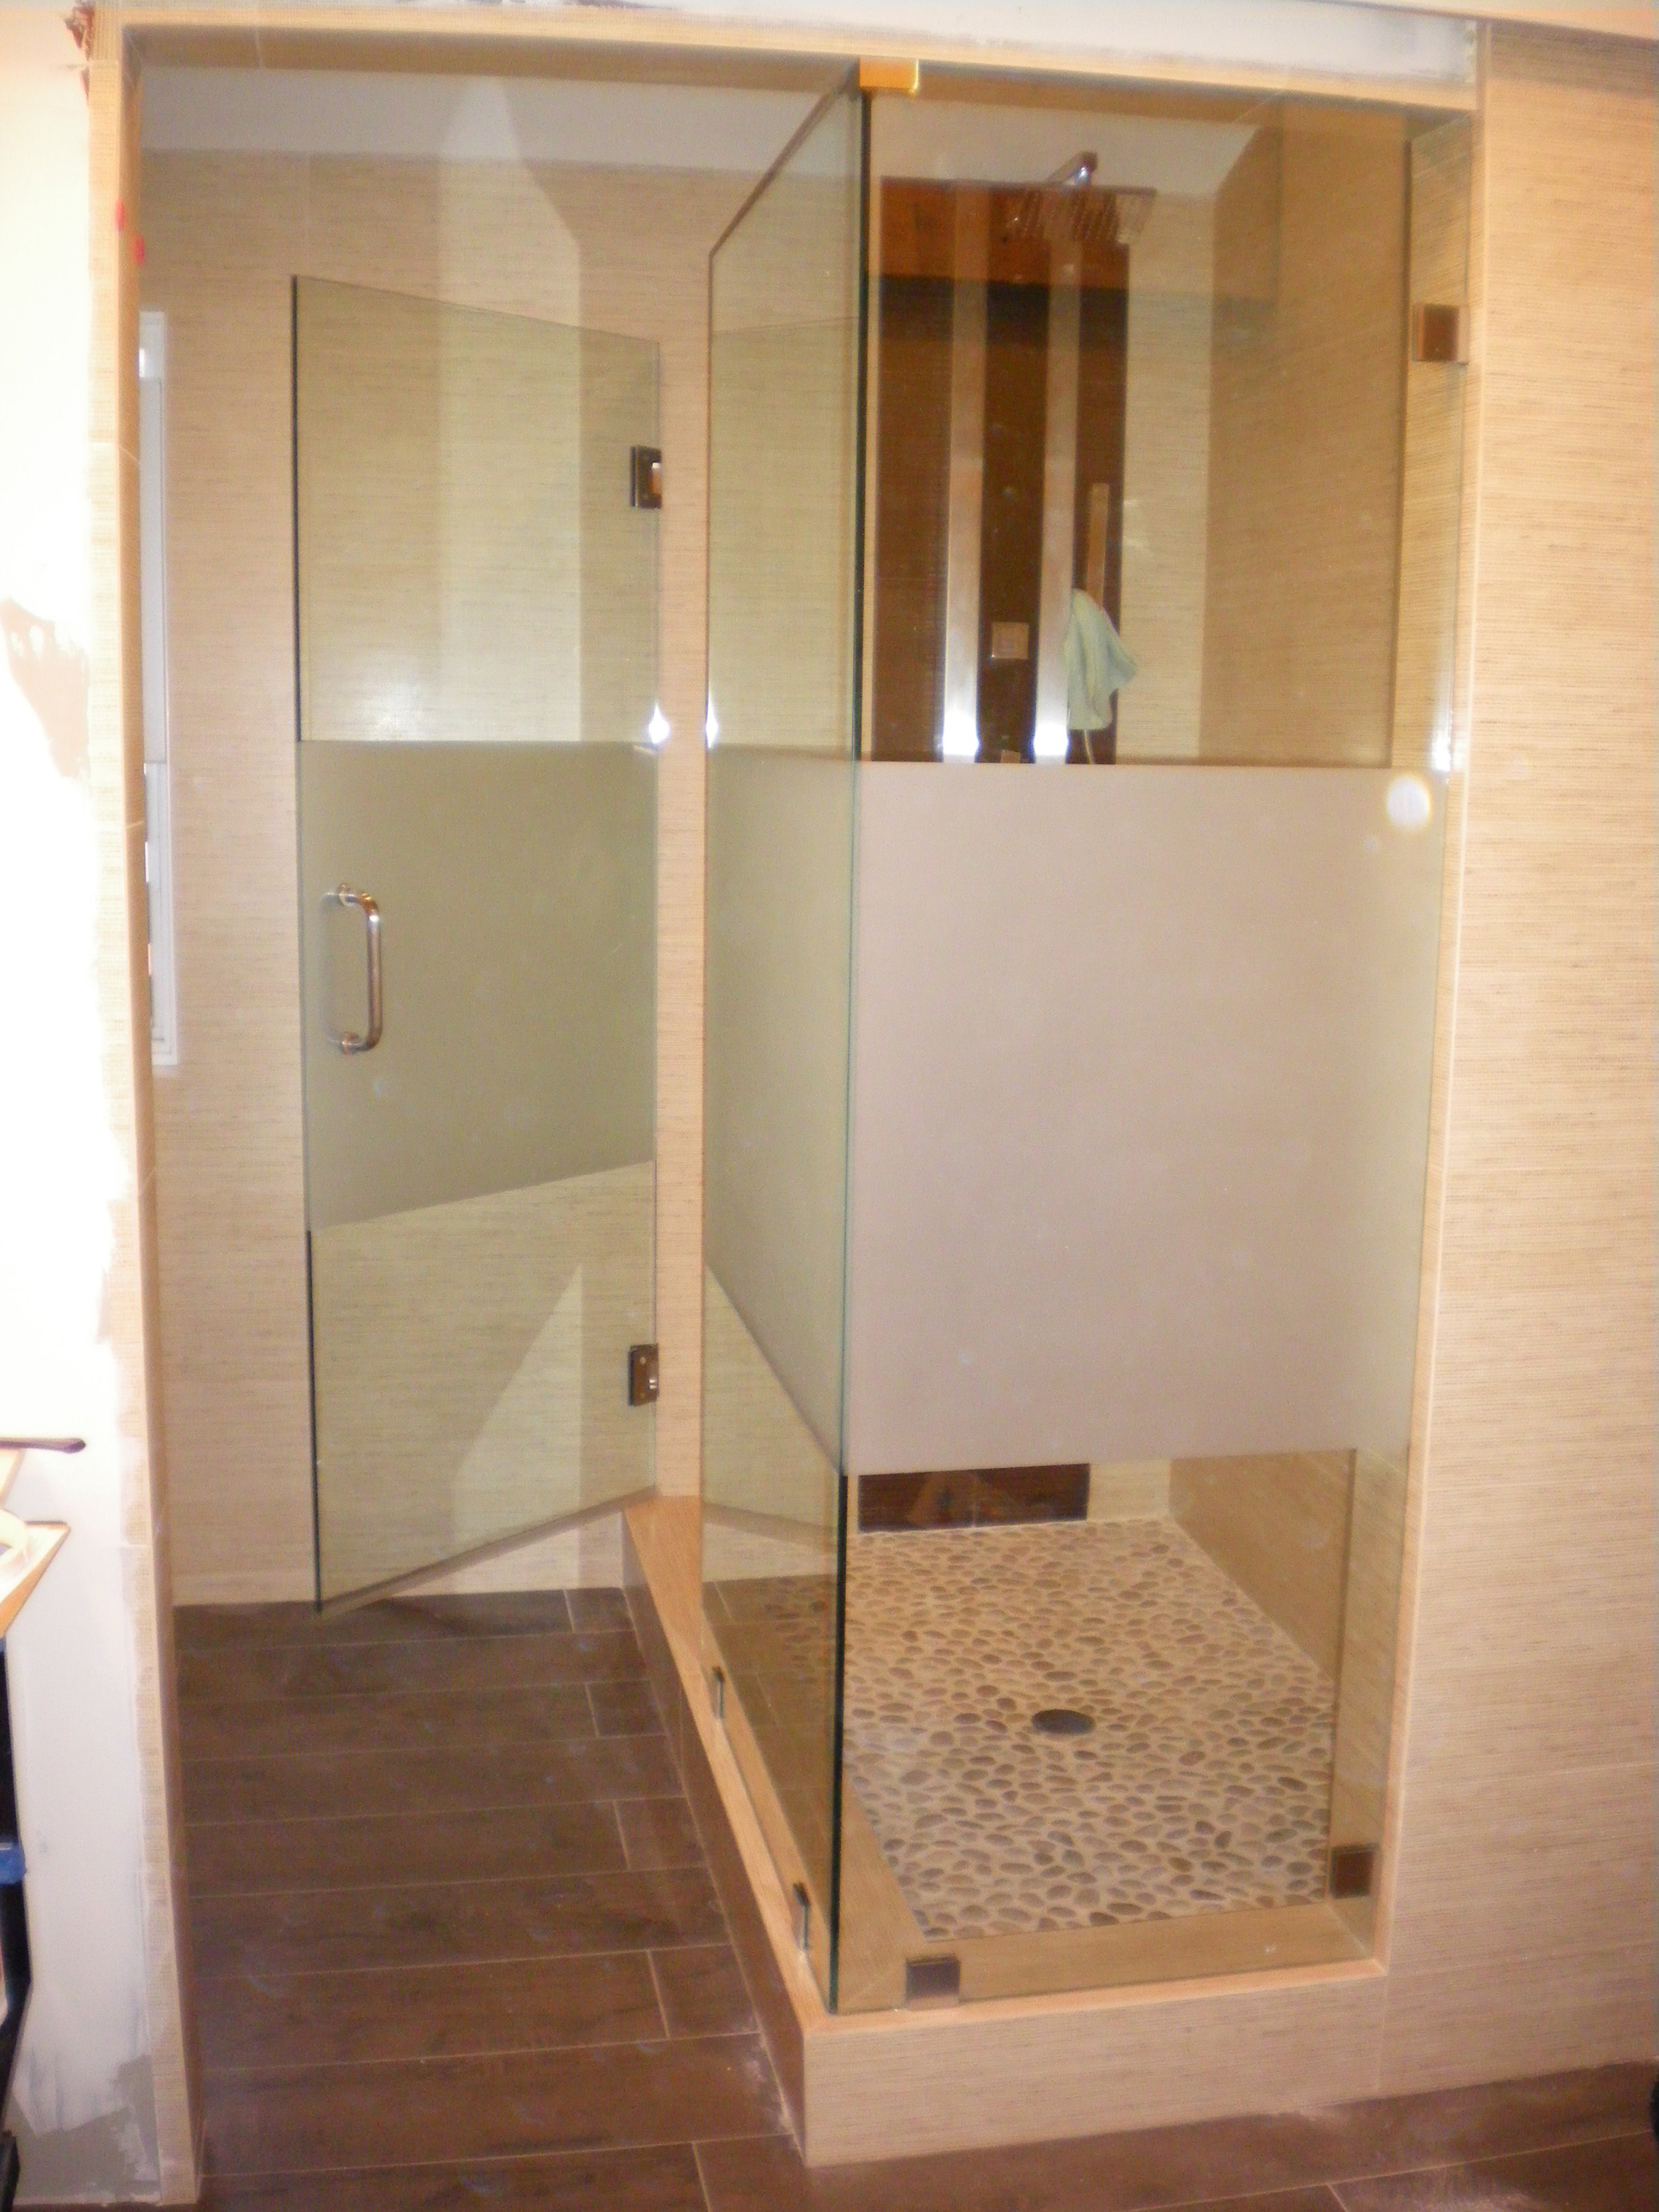 Shower-Doors-Residential-Photos-36.jpg